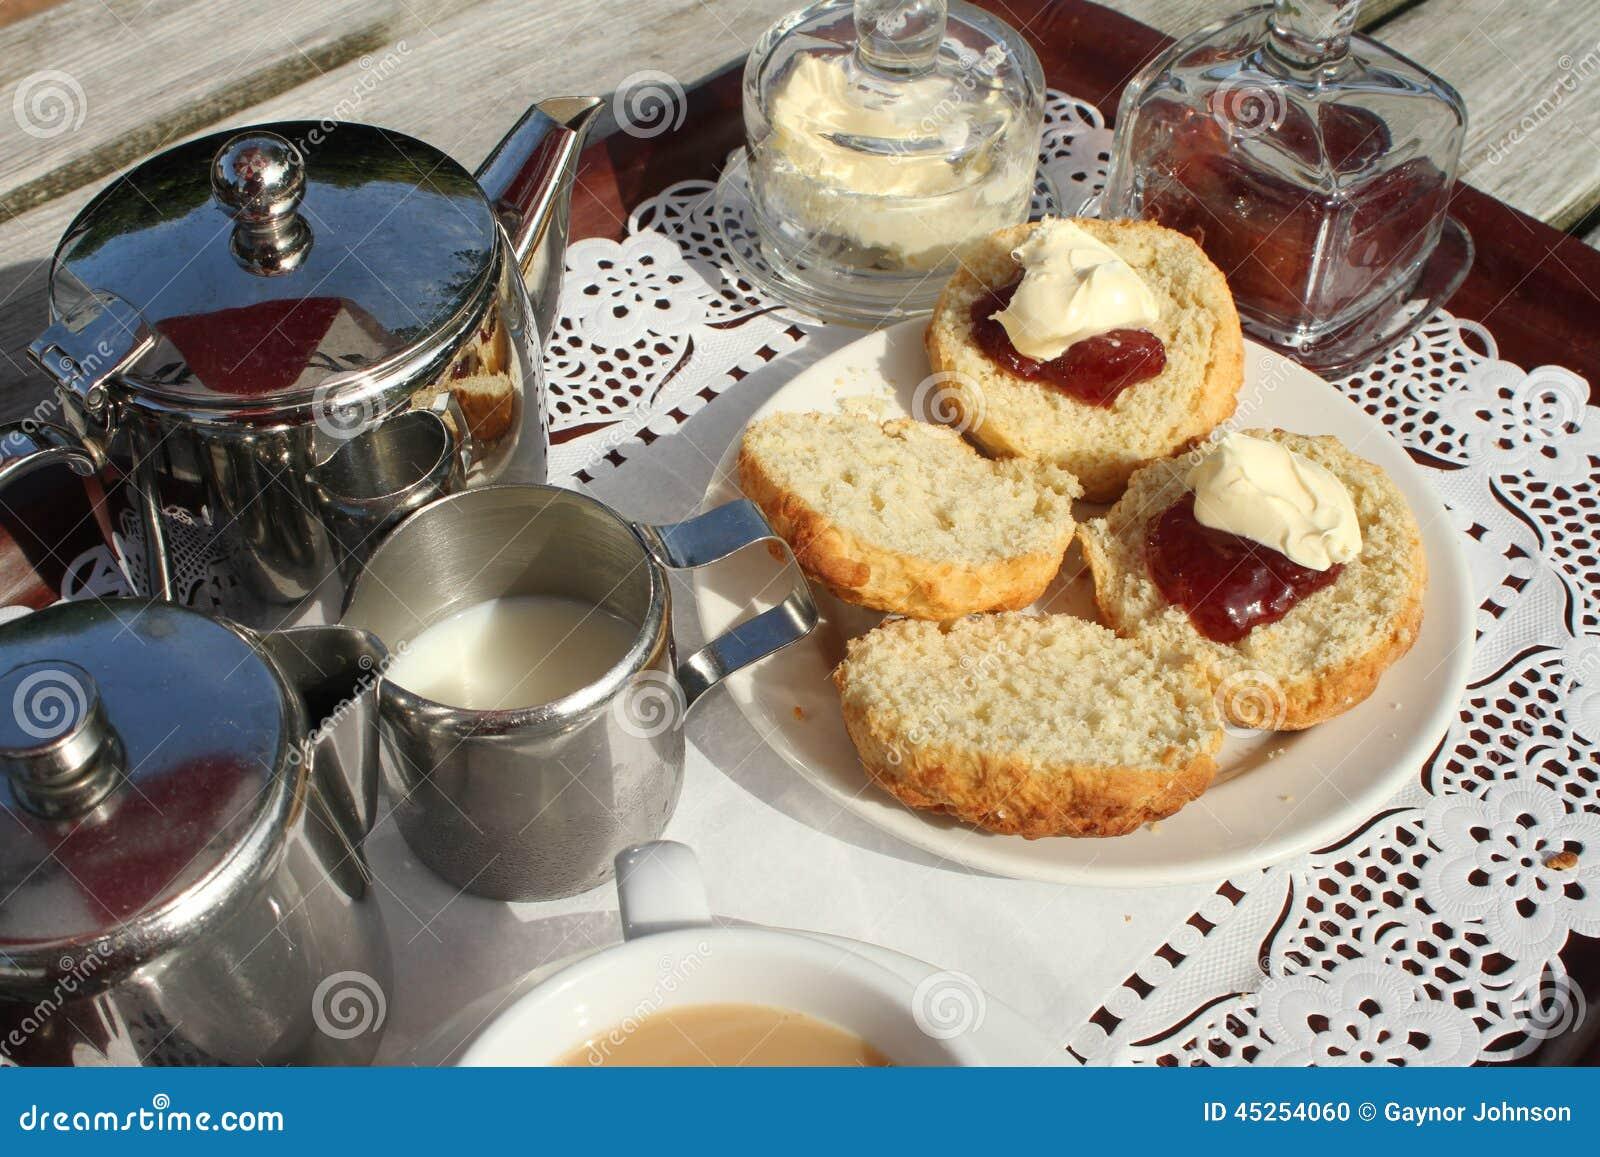 Cream Tea on a tray